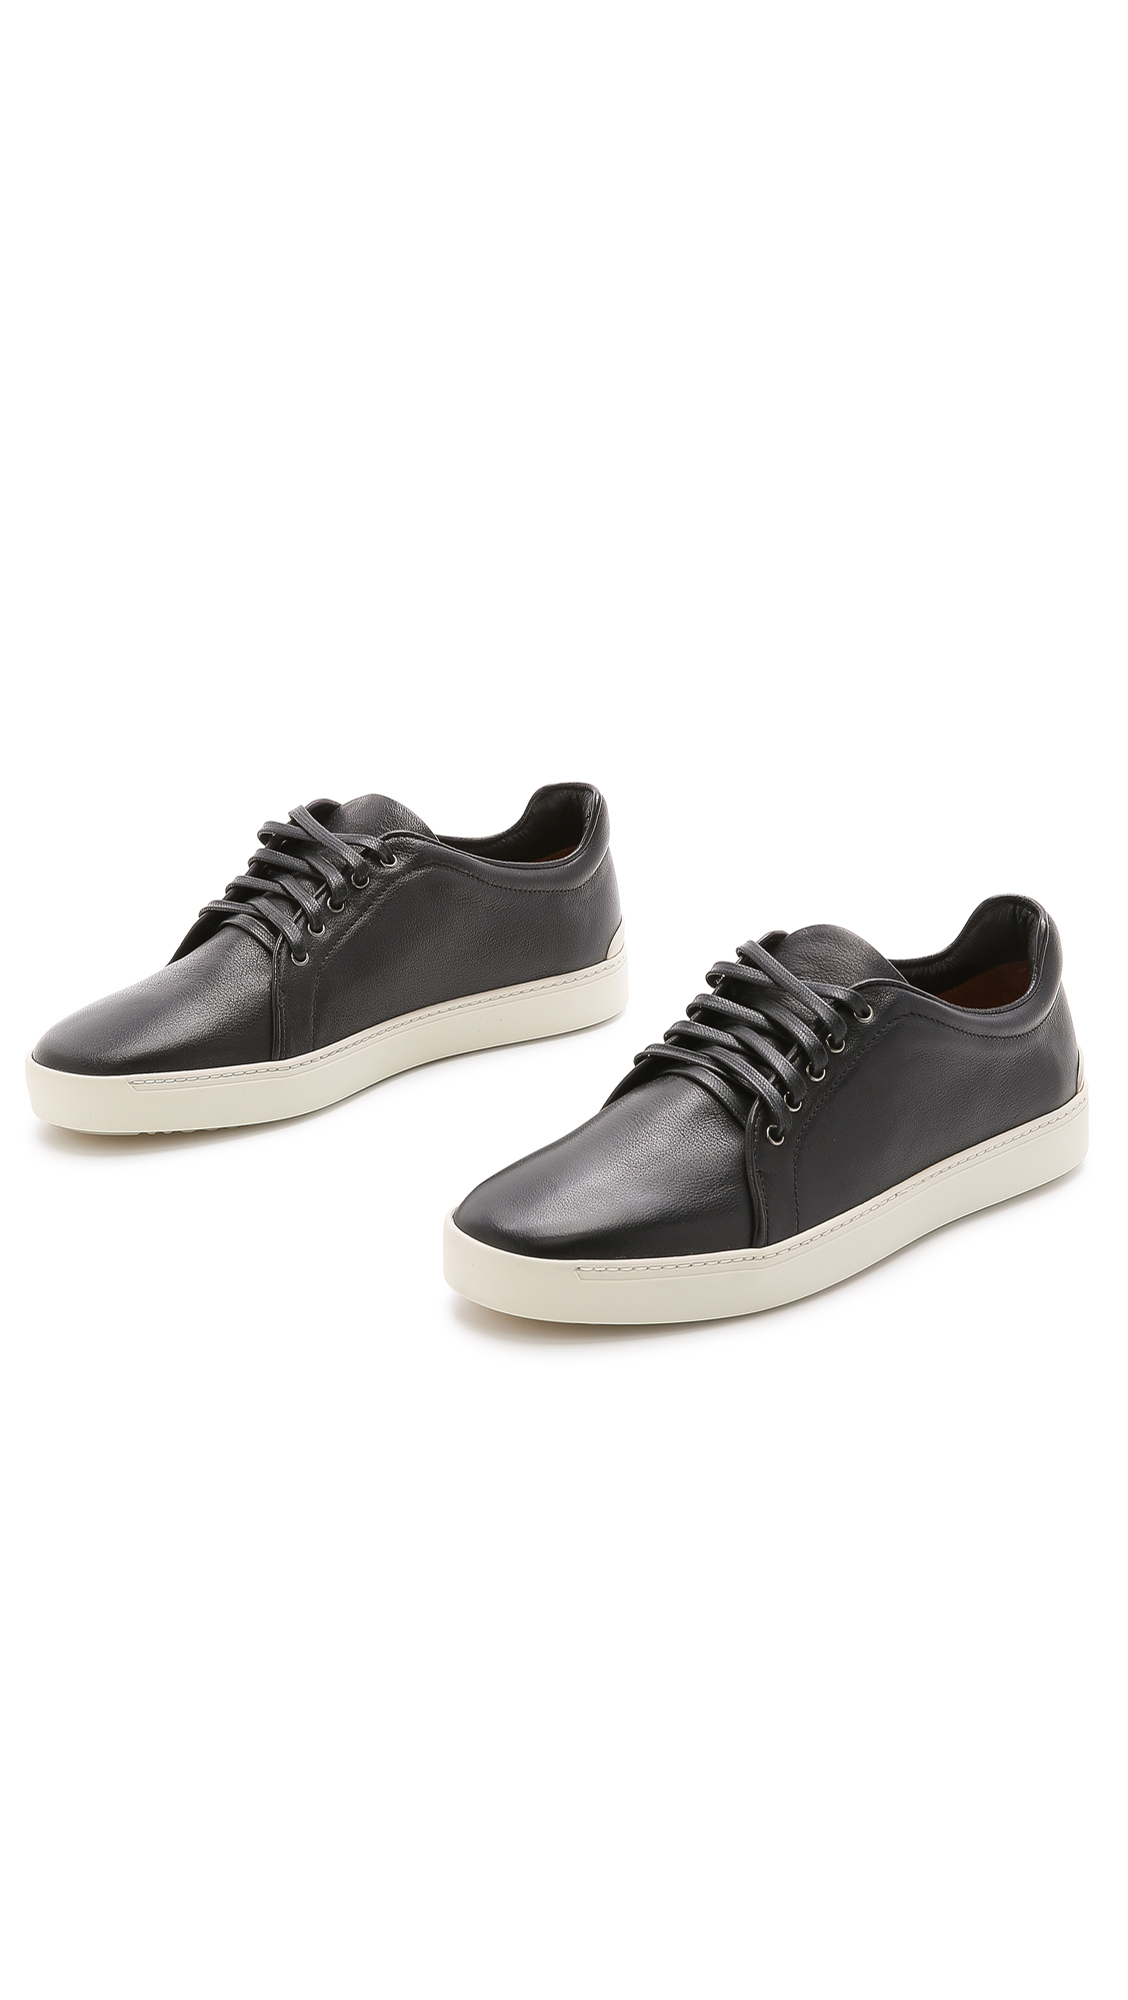 Rag & bone Kent Lace Up Sneakers in Black for Men